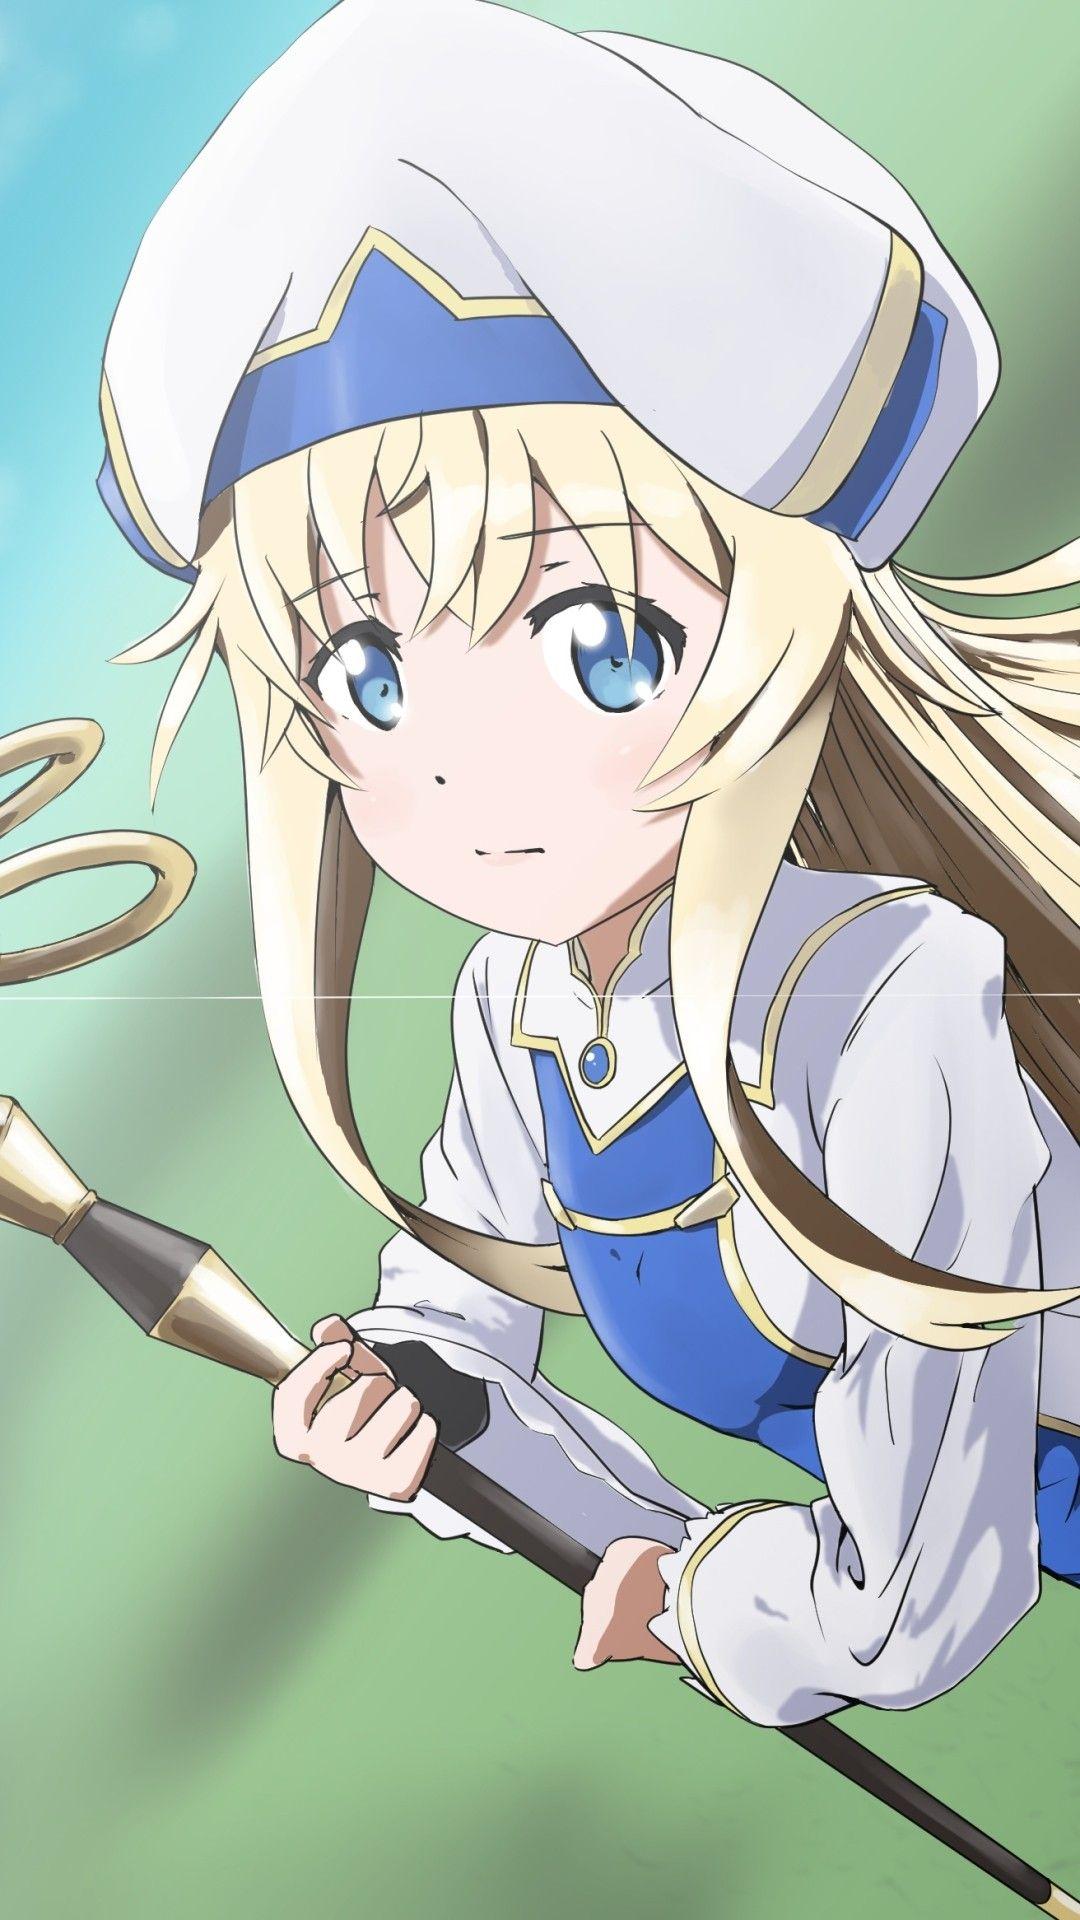 Anime/ goblin Slayer Фуры, Хвостики, Крылья